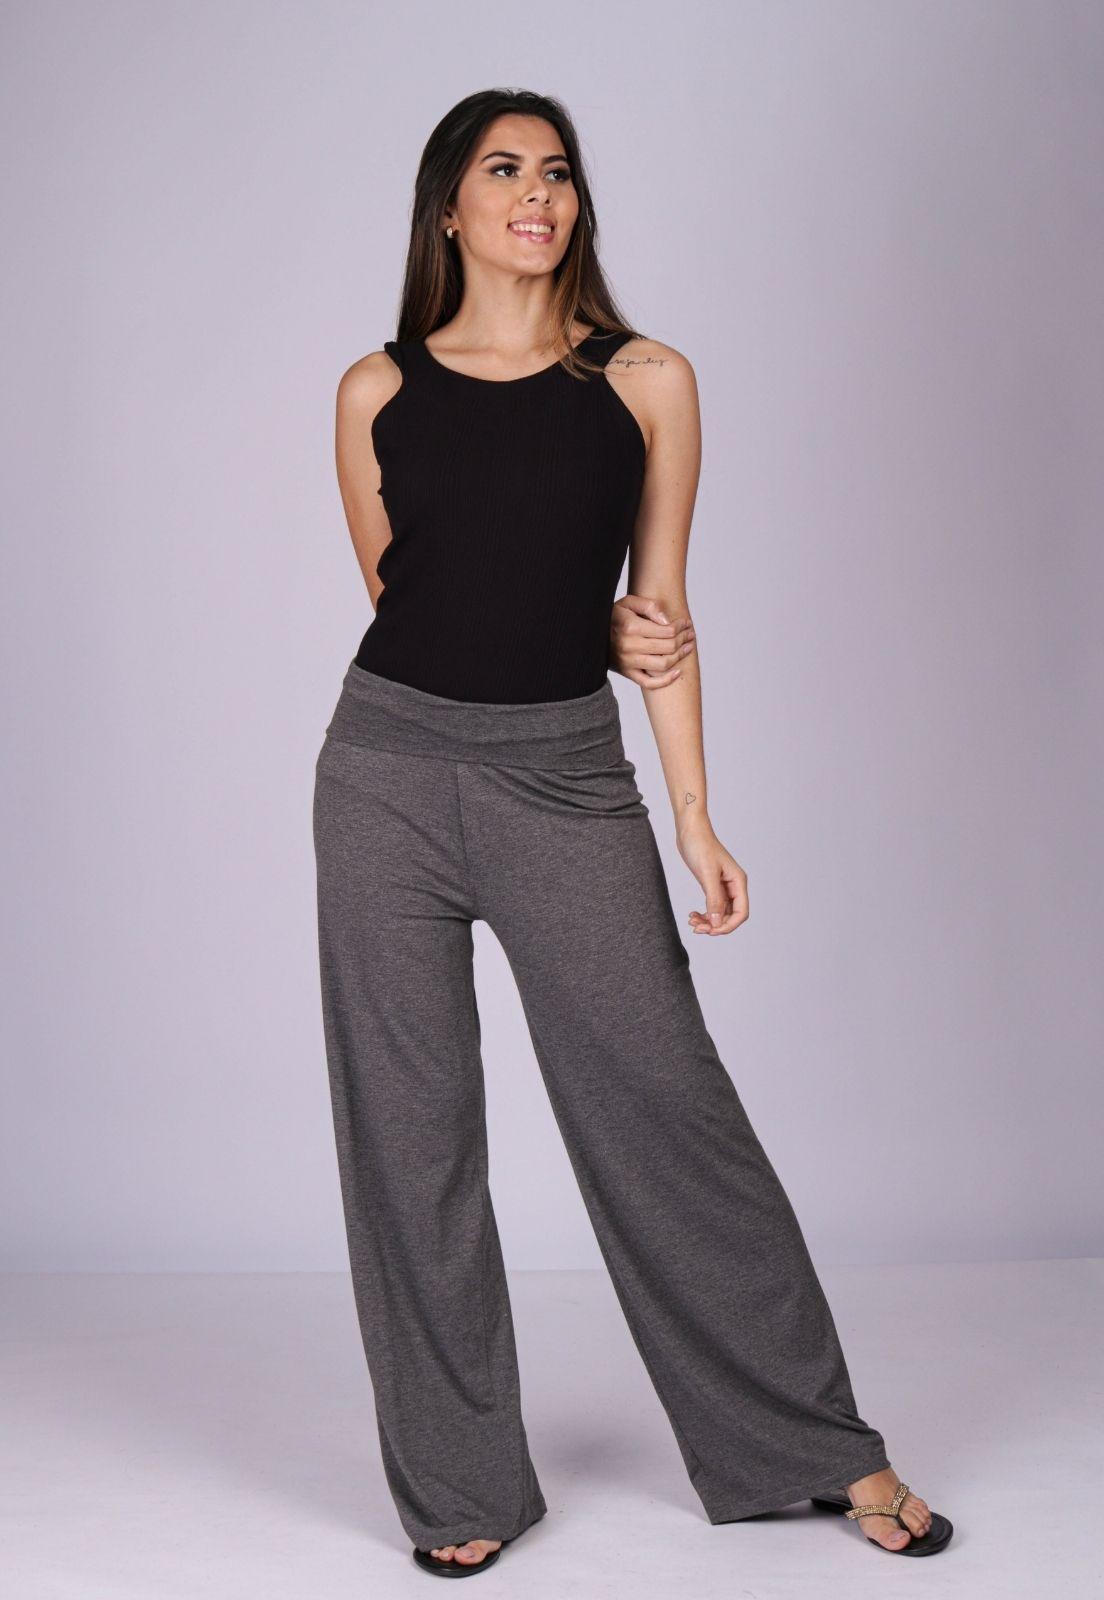 Calça Pantalona Reta Malha Cós Alto Mescla